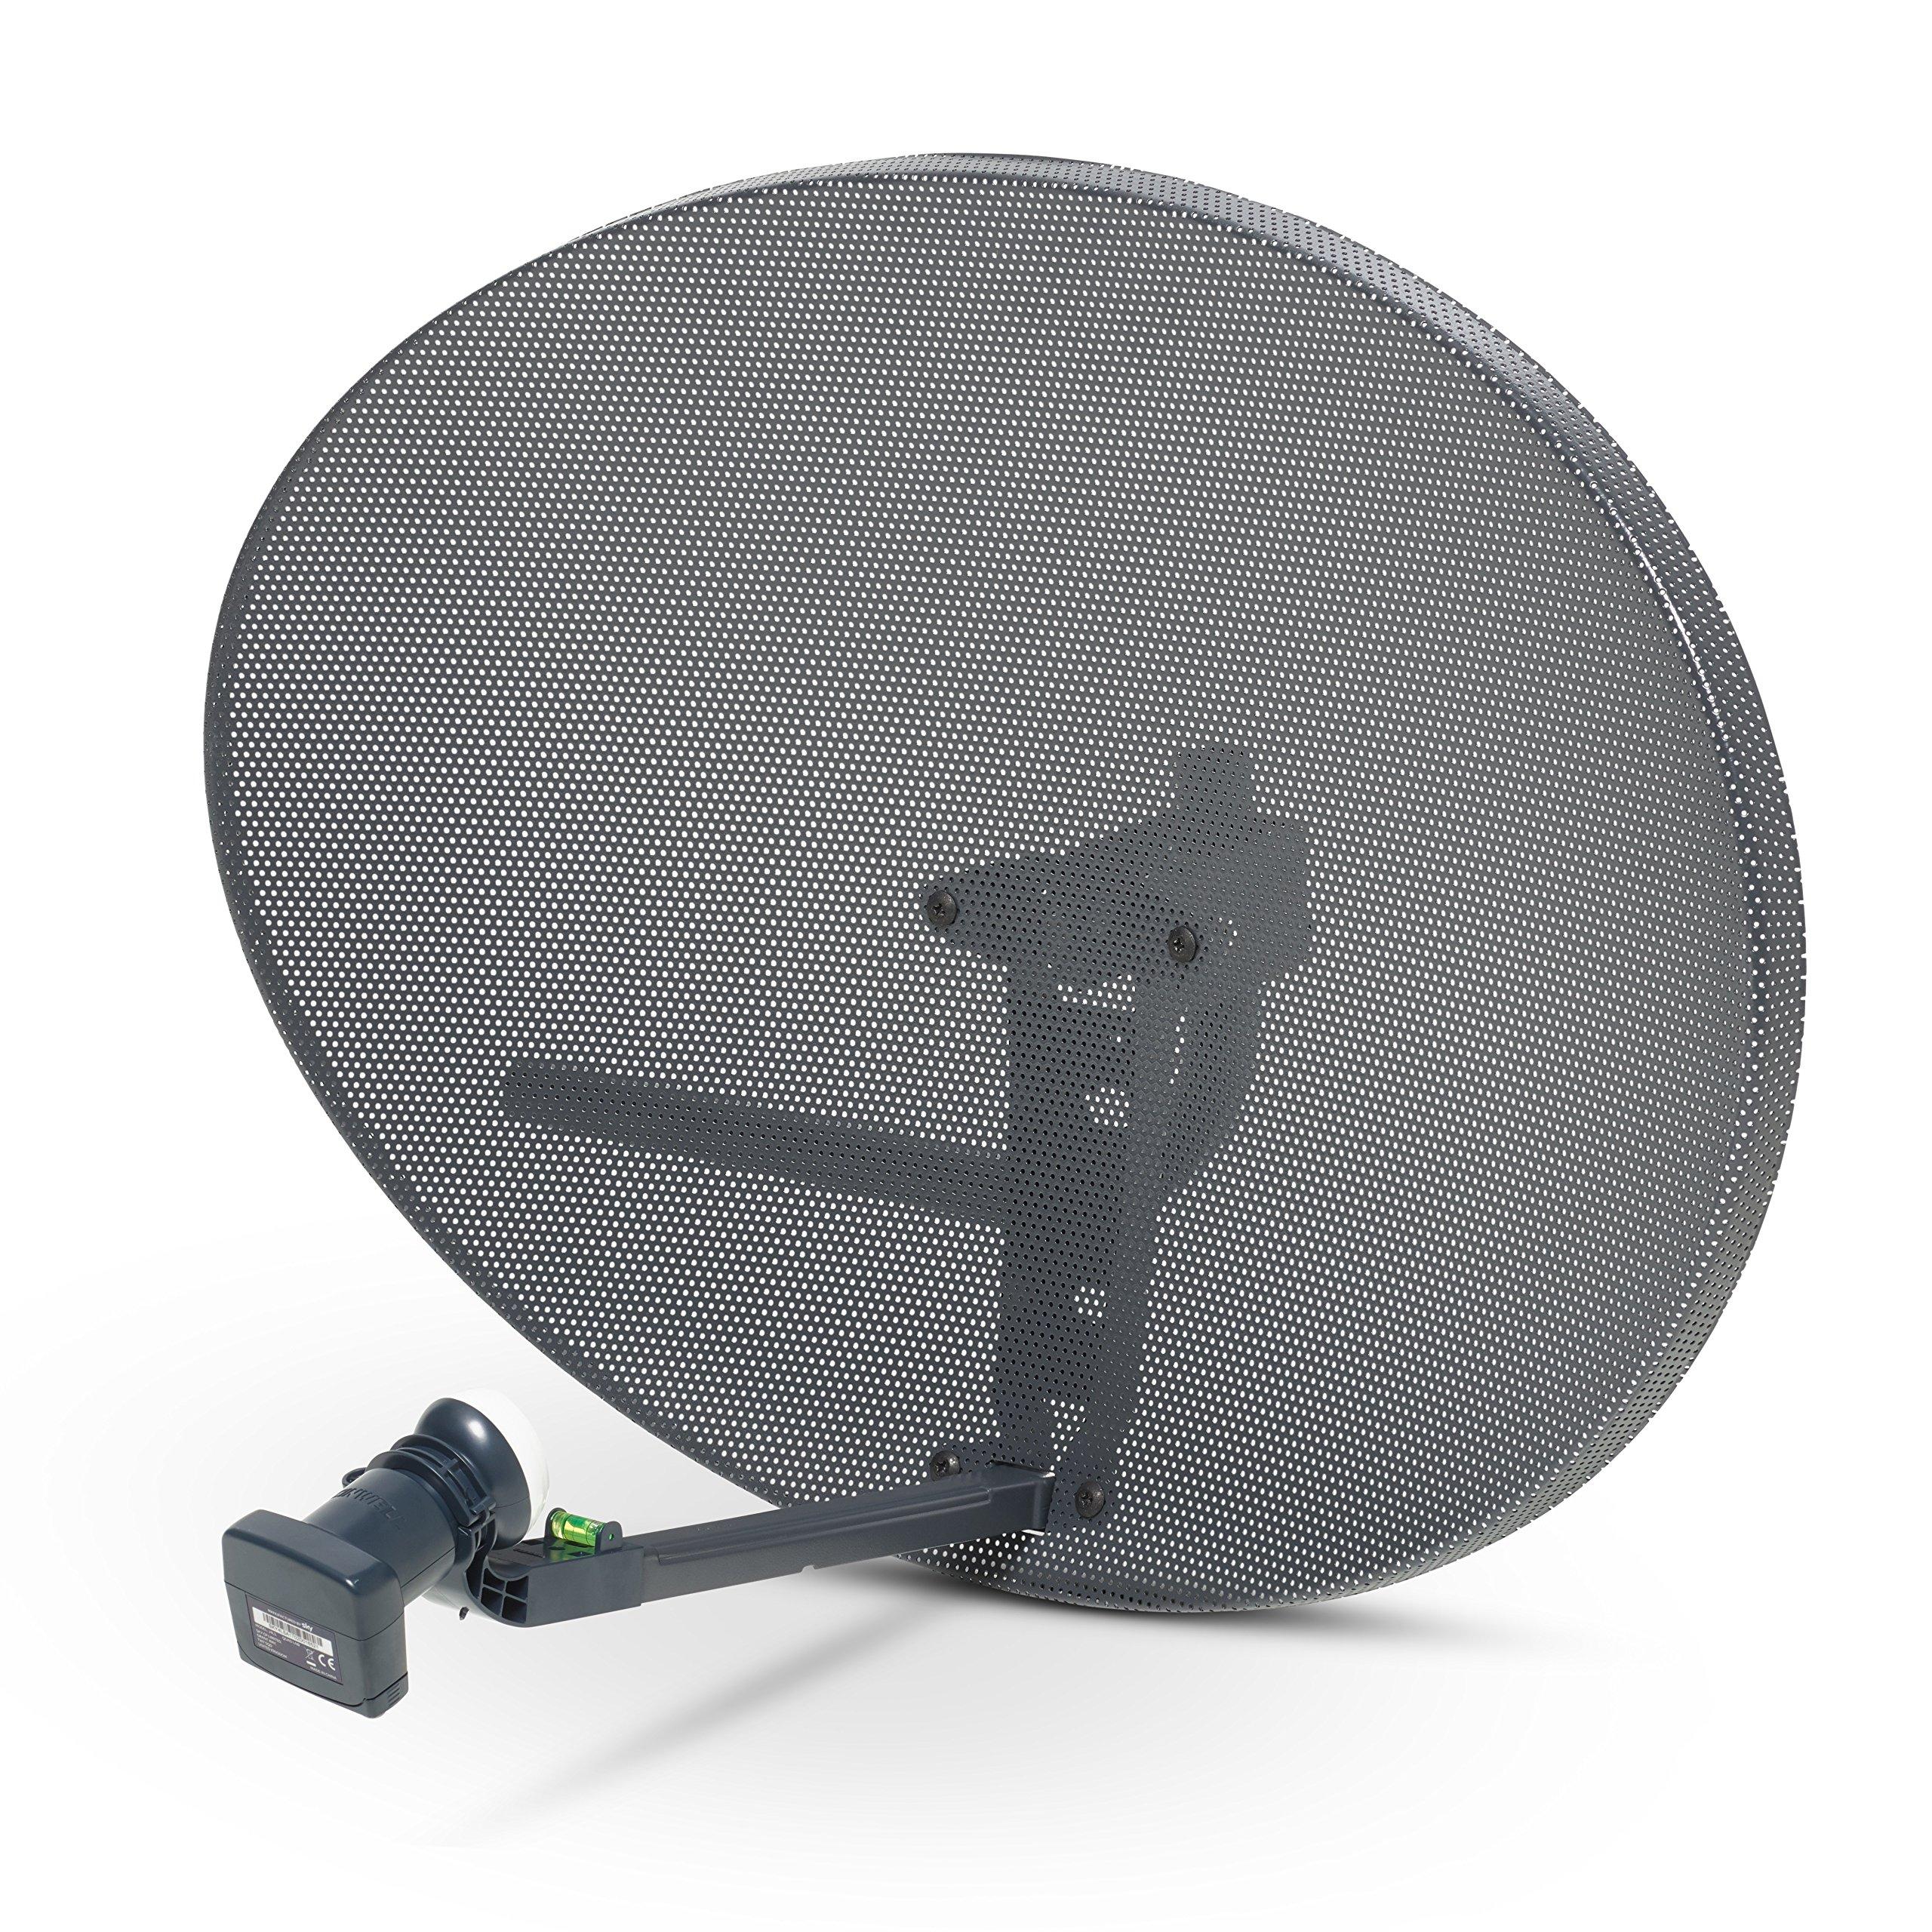 SSL Satellites Zone 2 Satellite Dish & Quad Lnb for Sky / FreeSat / Hotbird / Astra/ Polesat